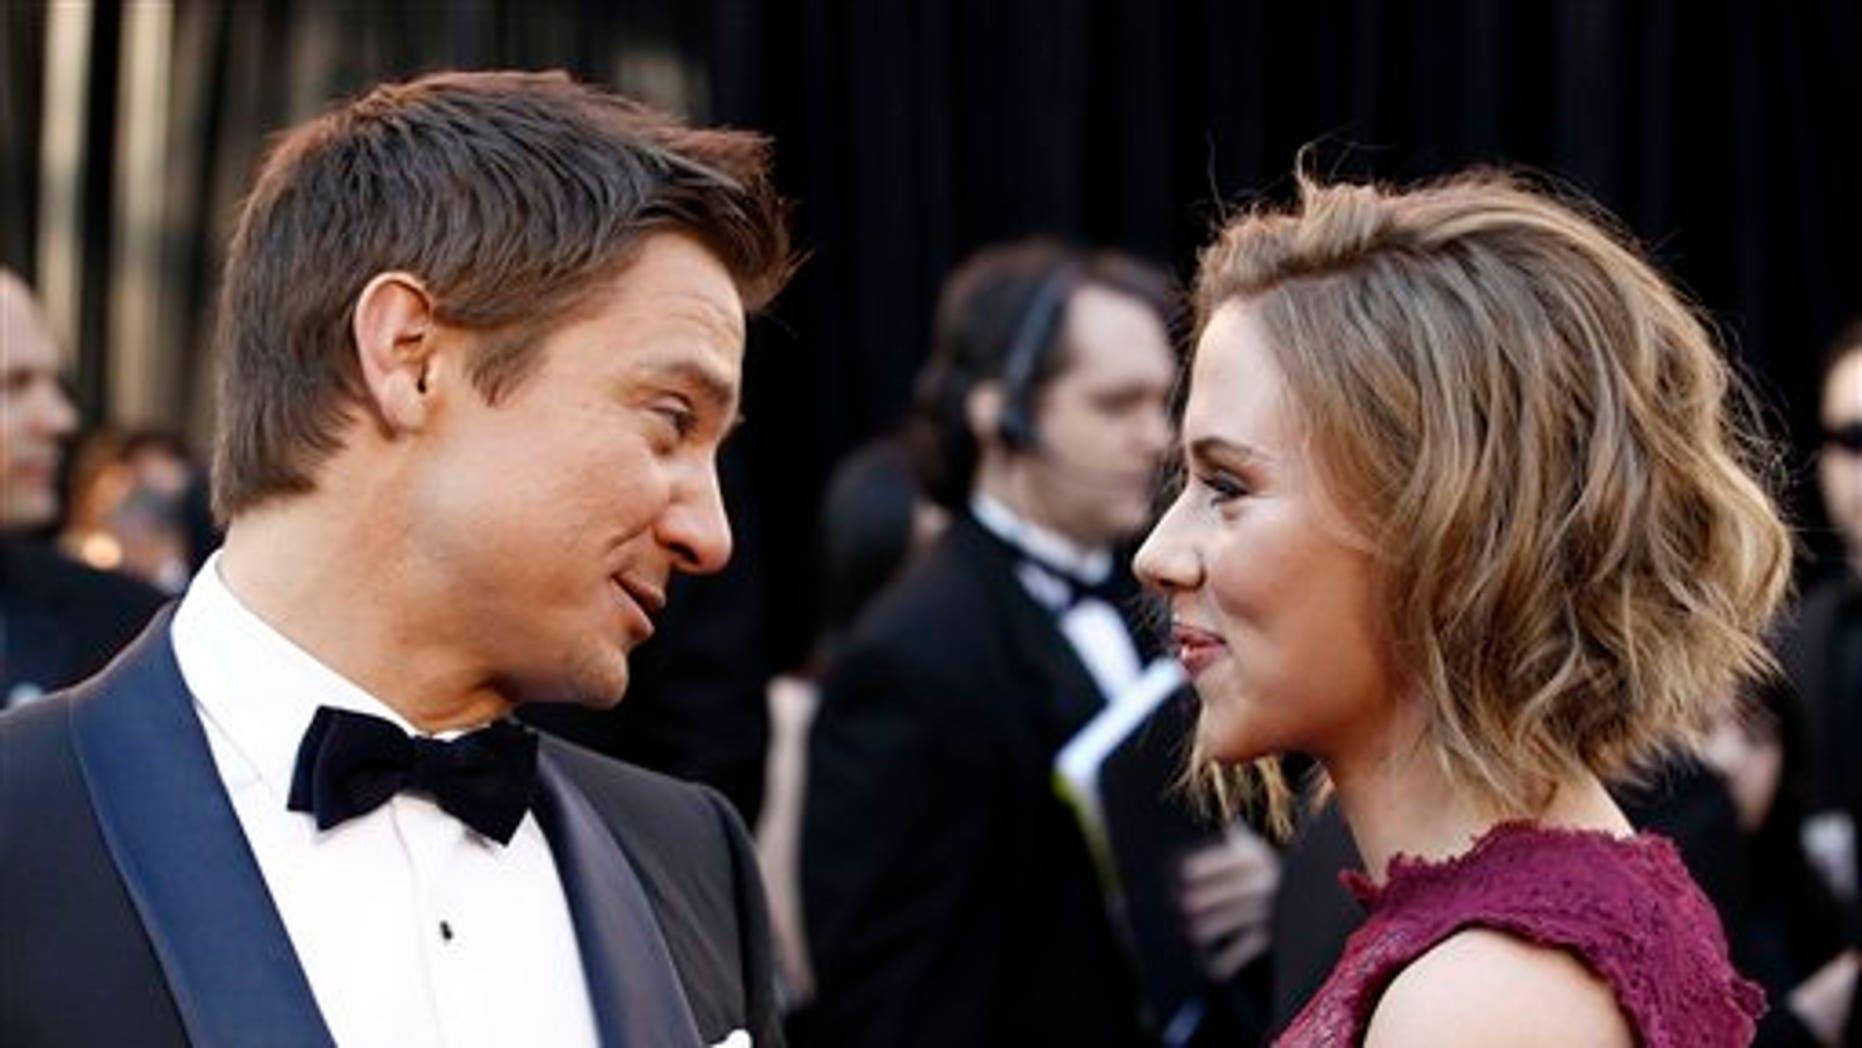 Jeremy Renner and Scarlett Johannson. (AP)